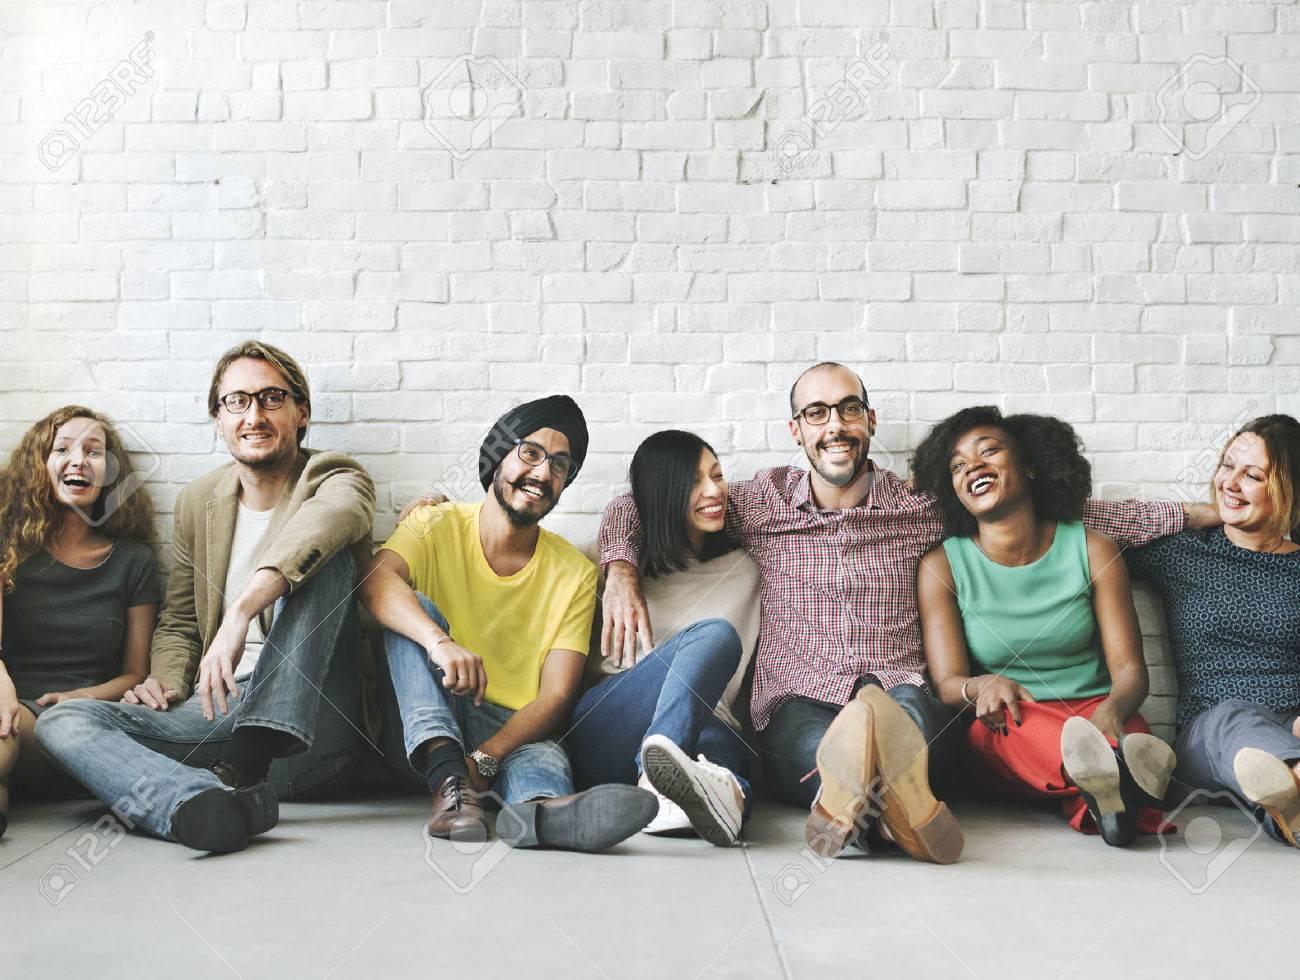 People Diversity Friends Friendship Happiness Concept - 54341622